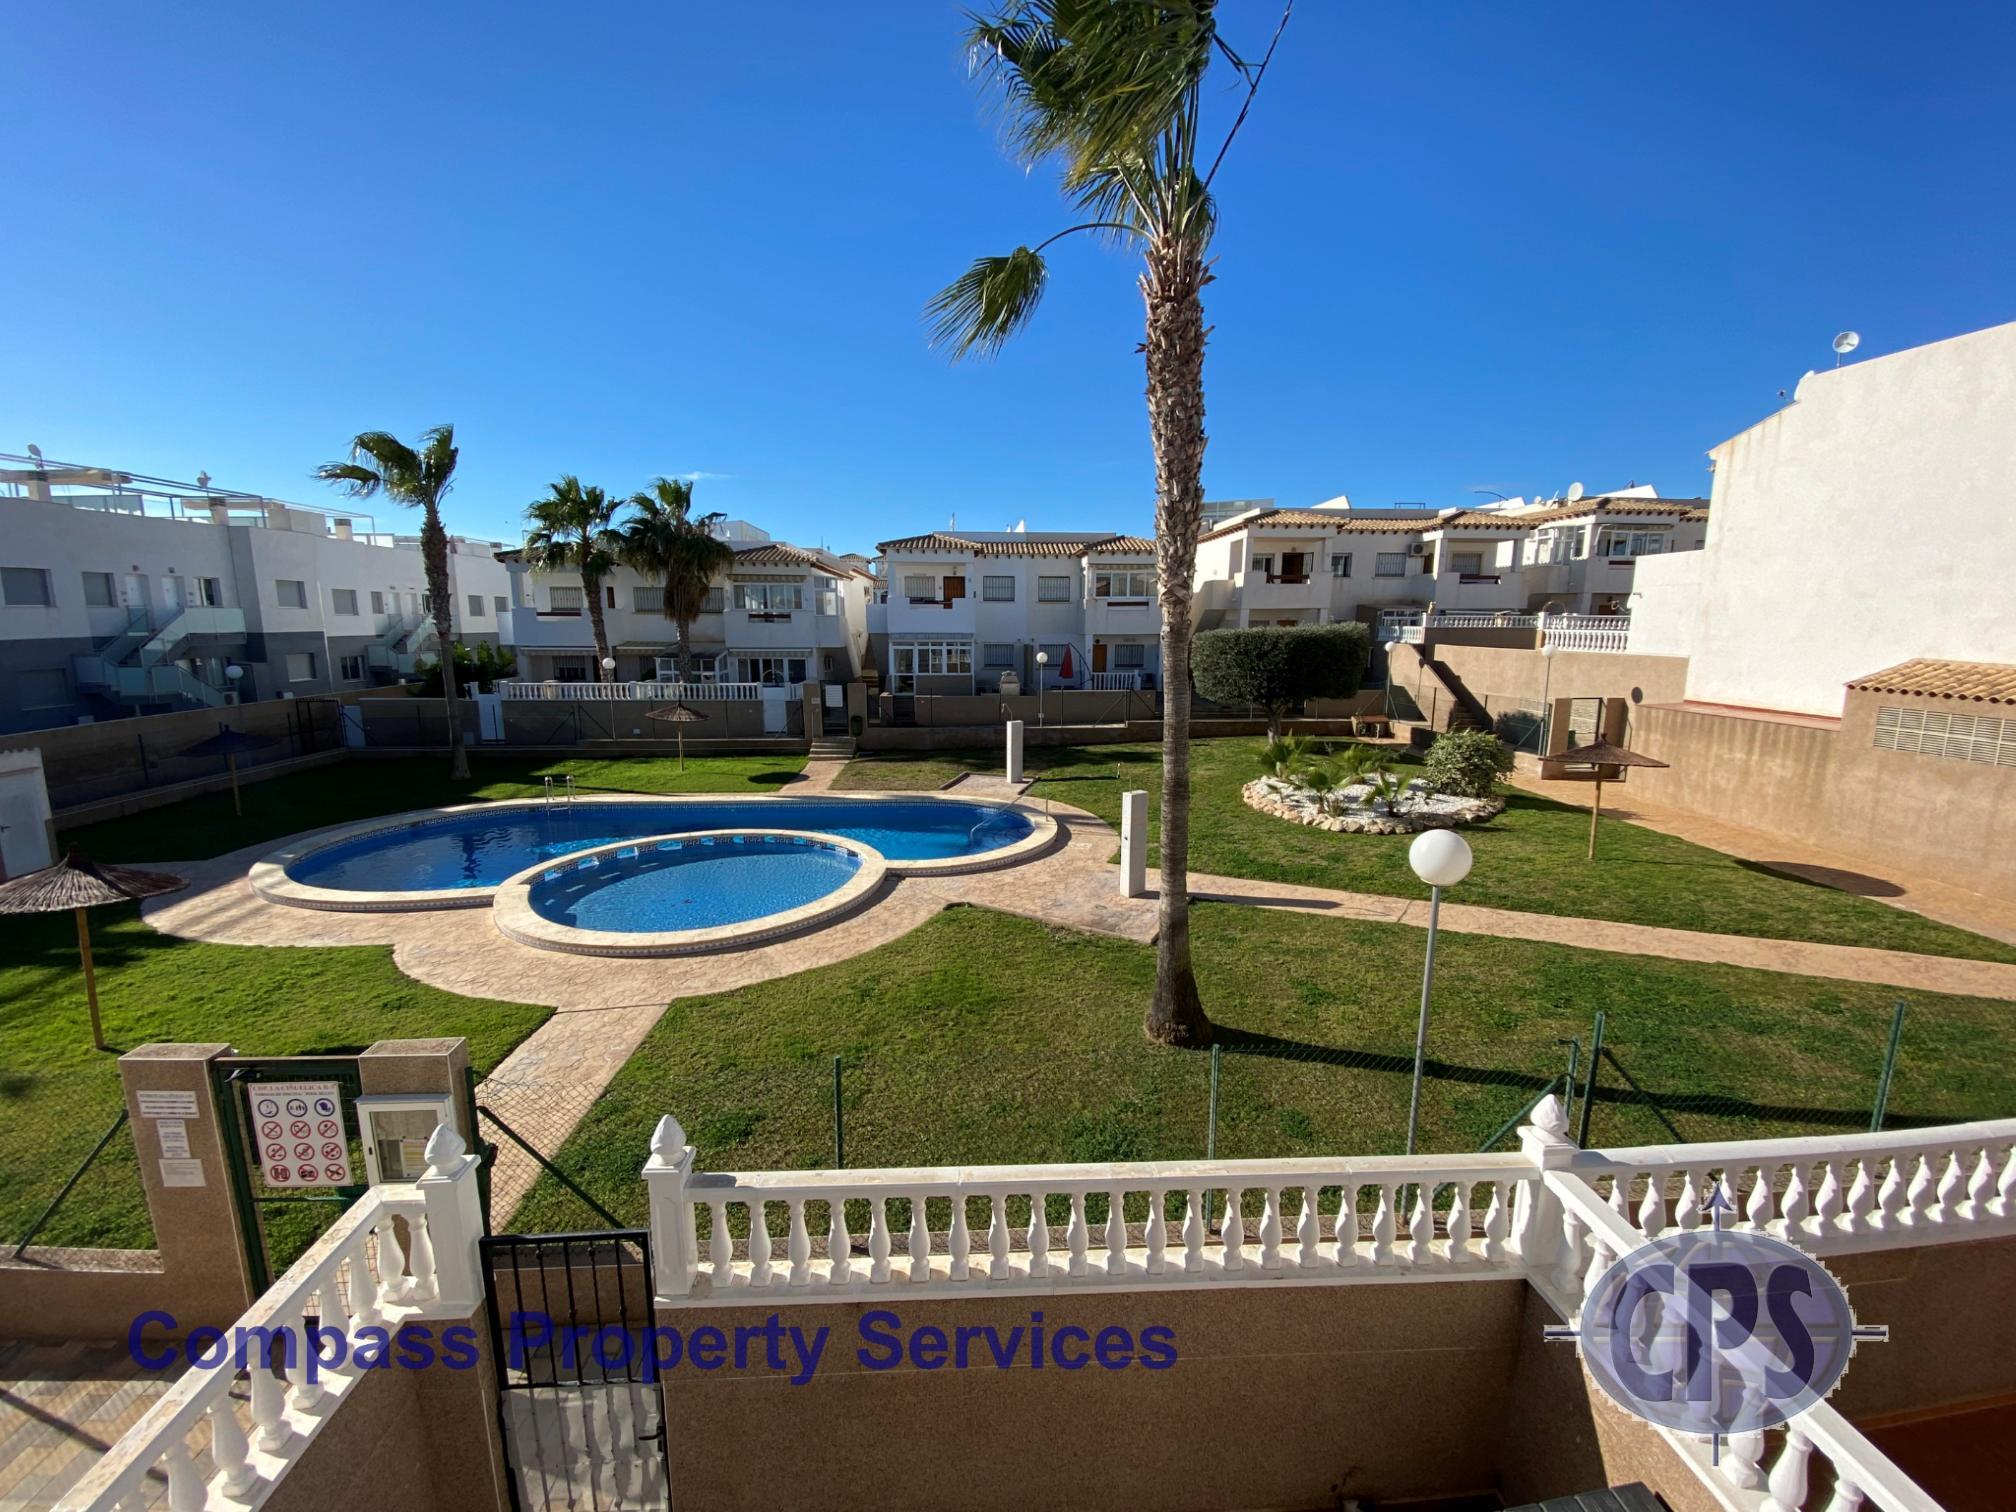 Apartment La Cinuelica R3 1st flr apt overlooking pool l149 photo 28556757